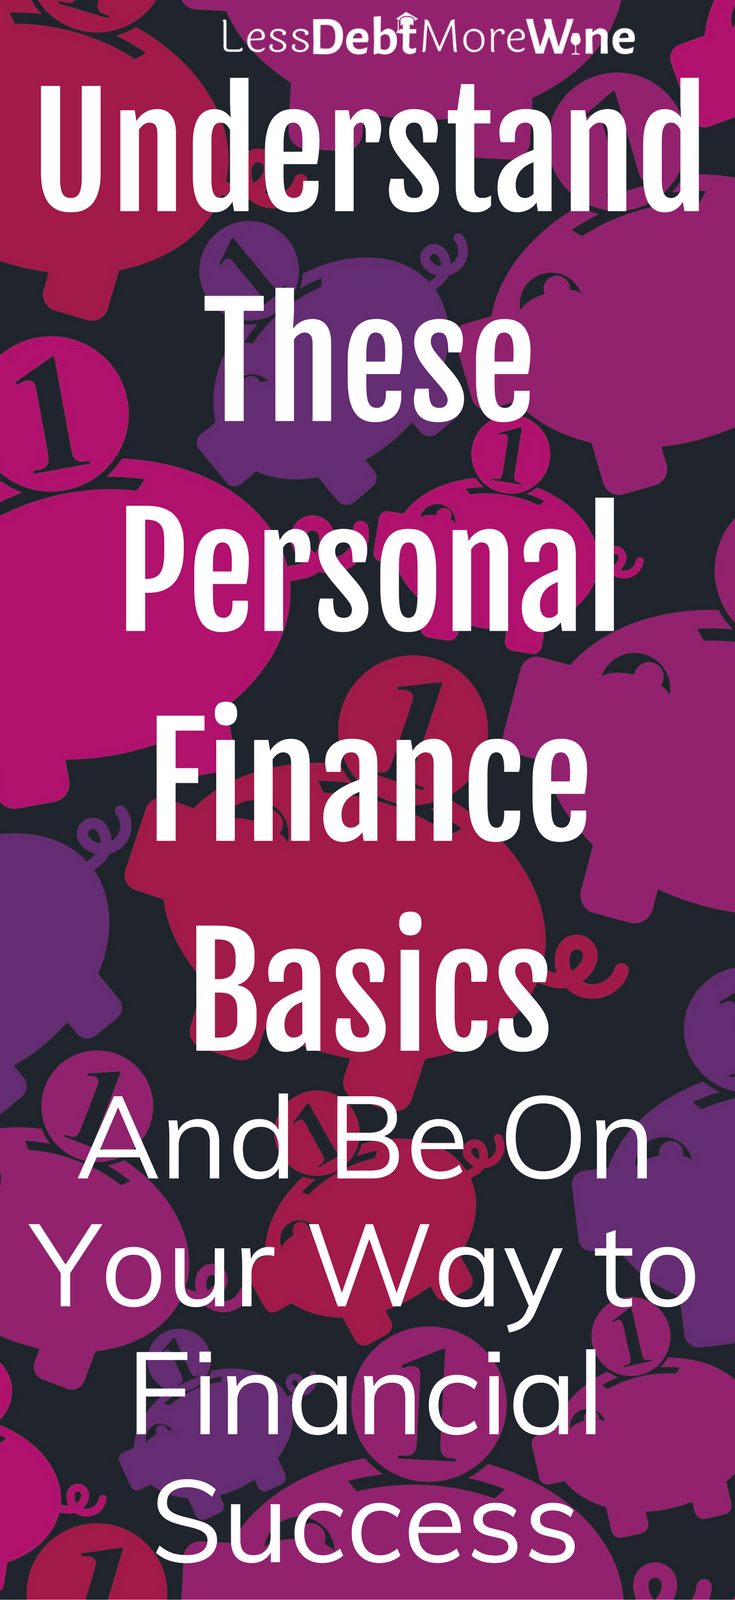 personal finance basics | personal finance tips | money management | money tips | millennial money tips